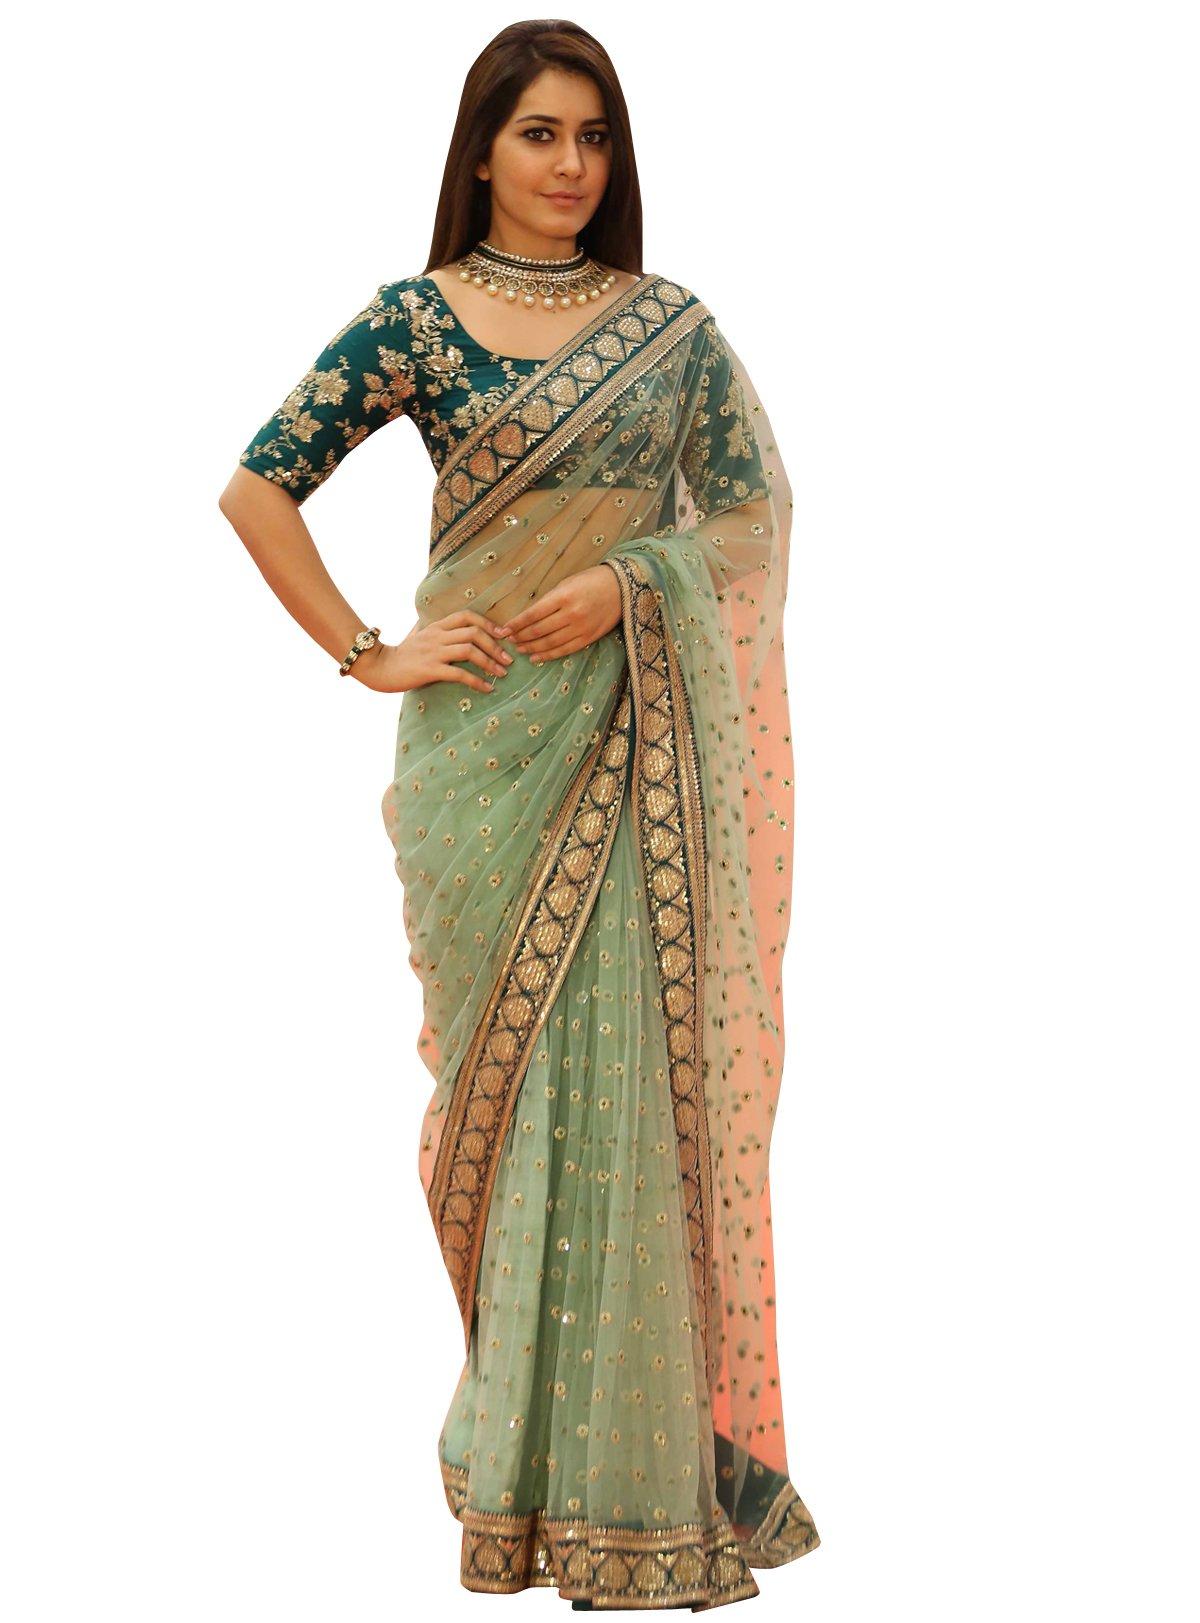 Delisa Fashion Women's Saree Sari Designer Indian Dress Bollywood Ethnic Party by Delisa (Image #1)